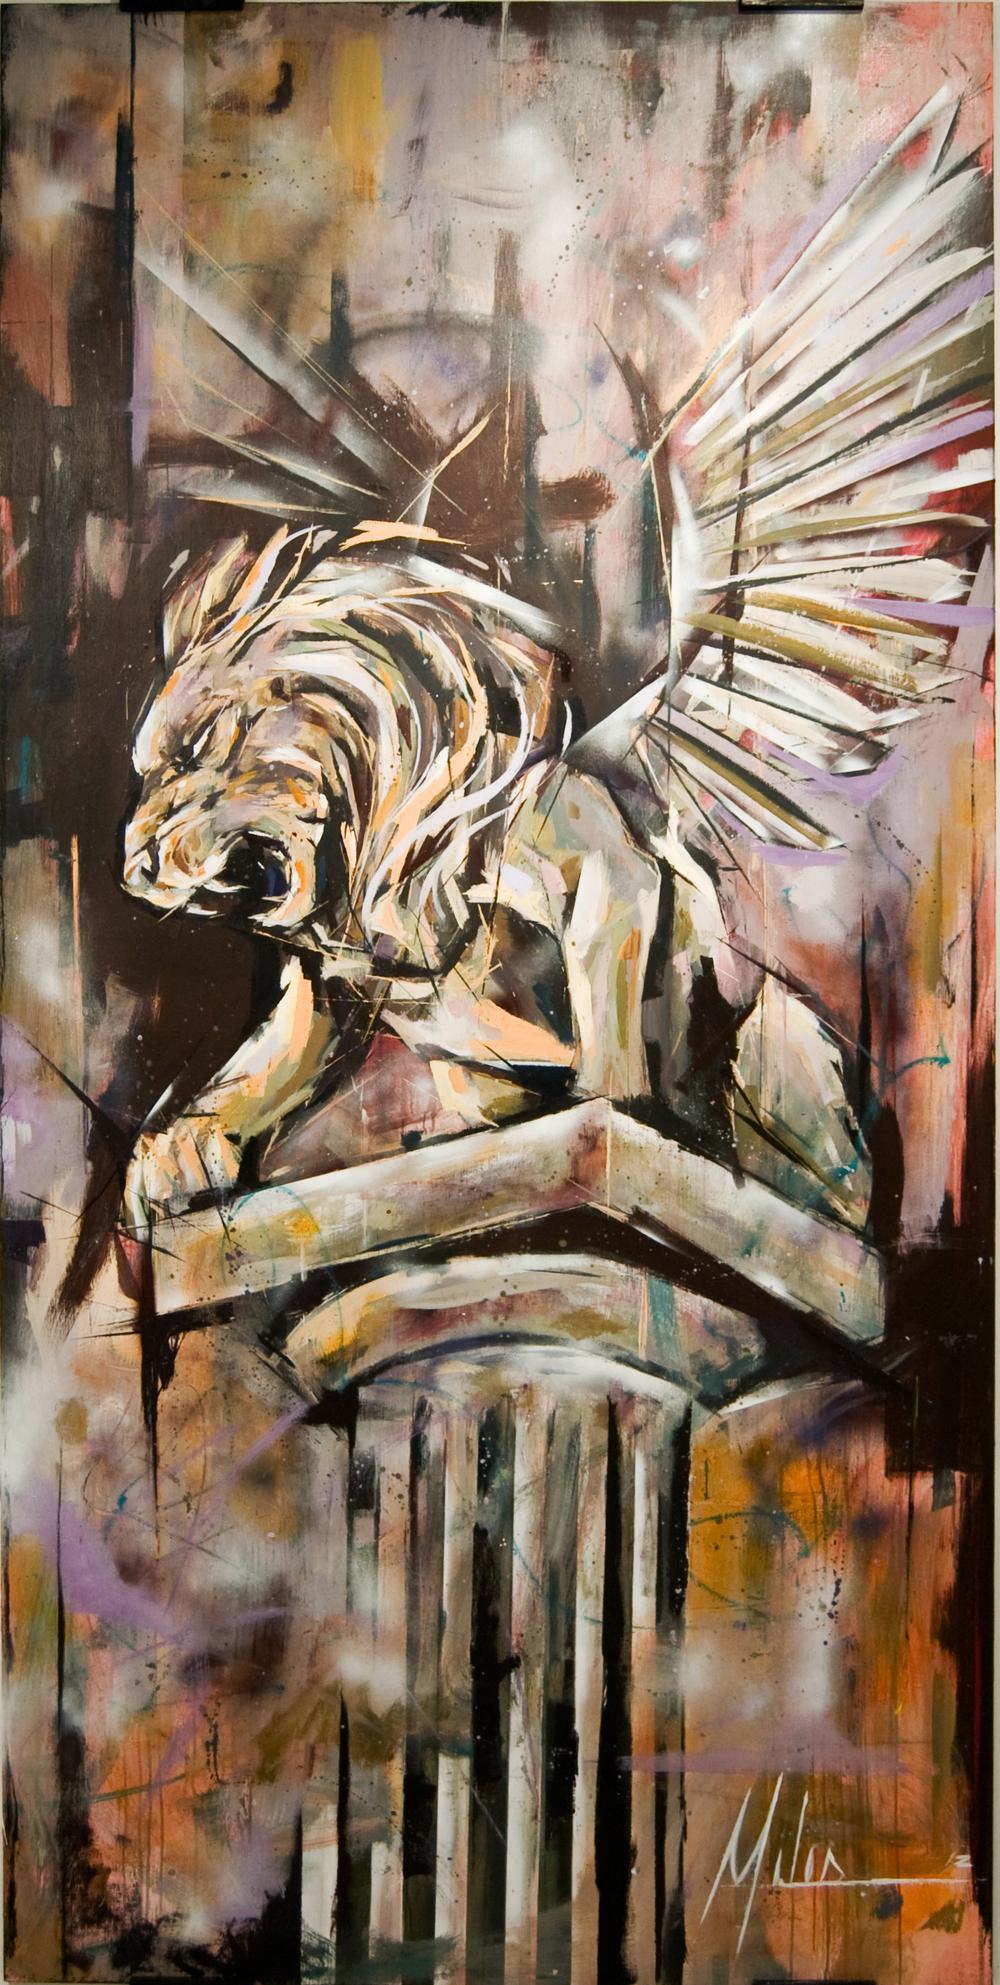 """The Gateway""  acrylic on wood panel  48"" x 96""  2012  $2400"